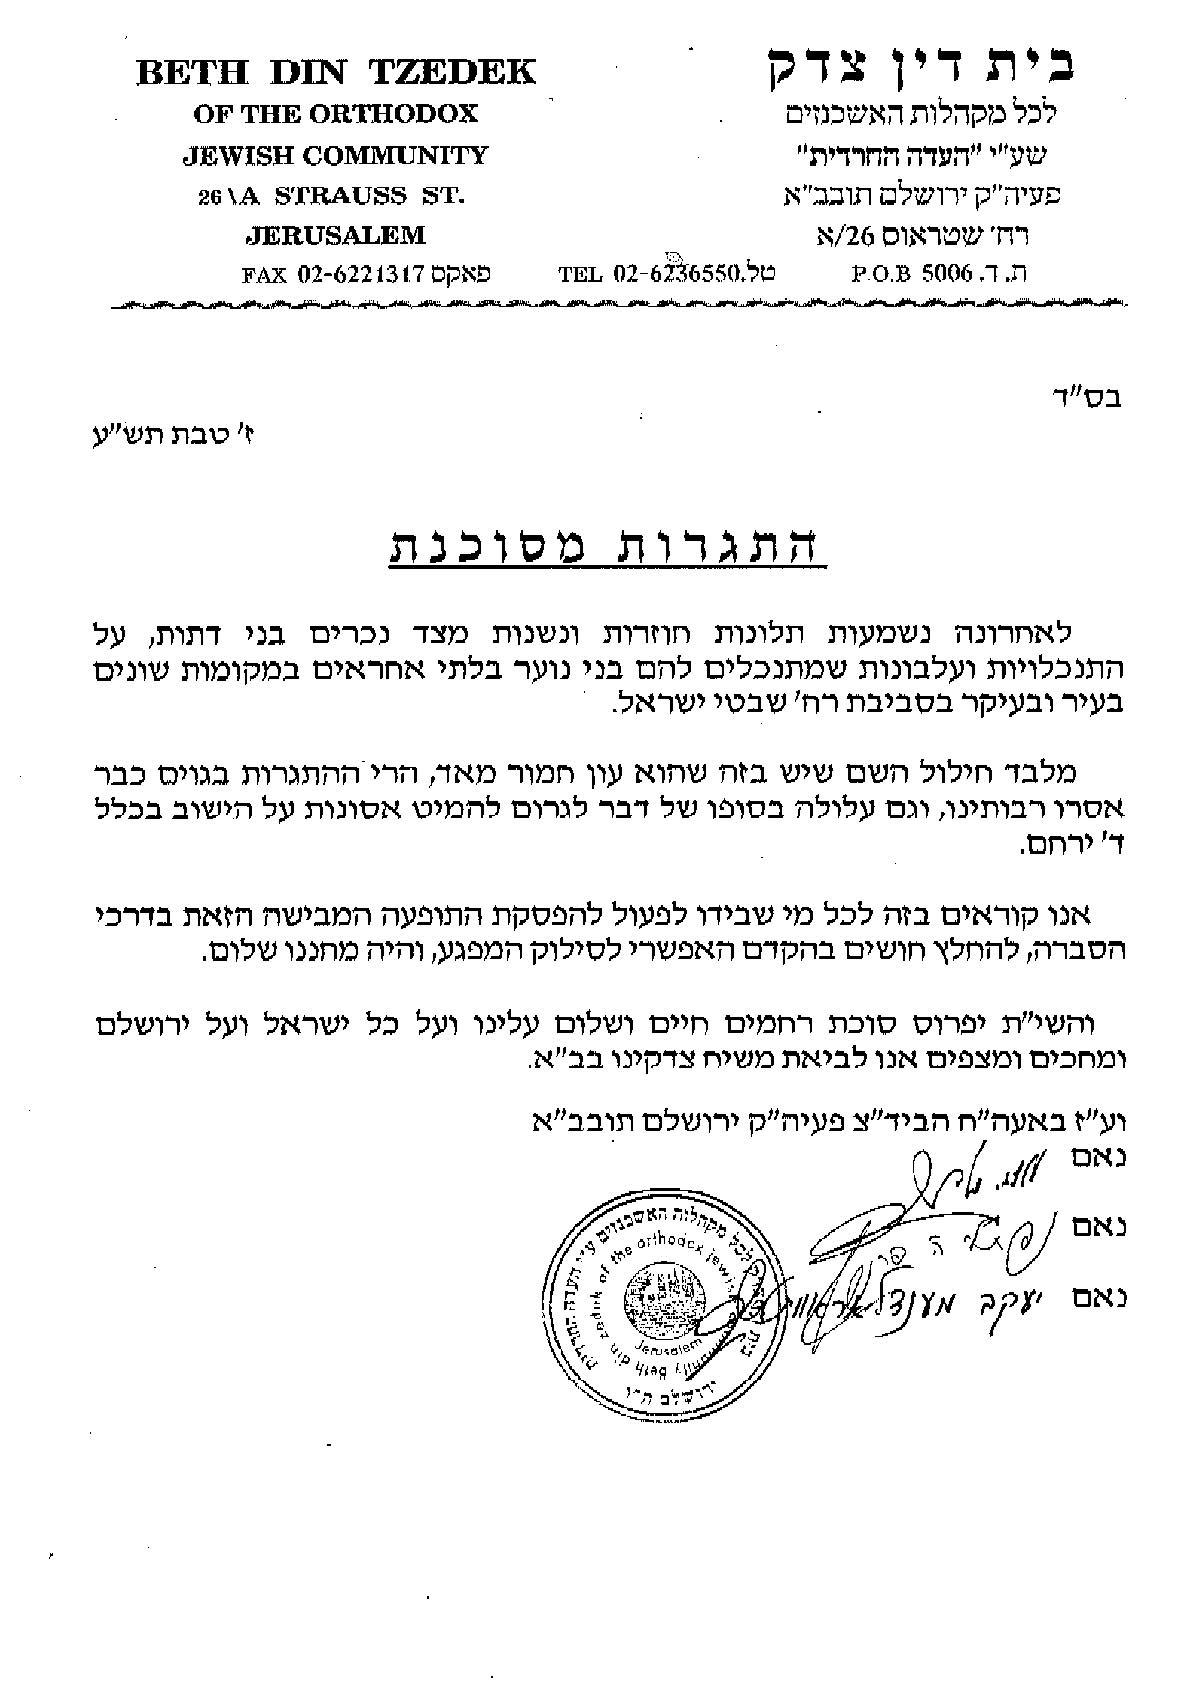 Eida Haredit Badatz Statement against Harassment of Churches